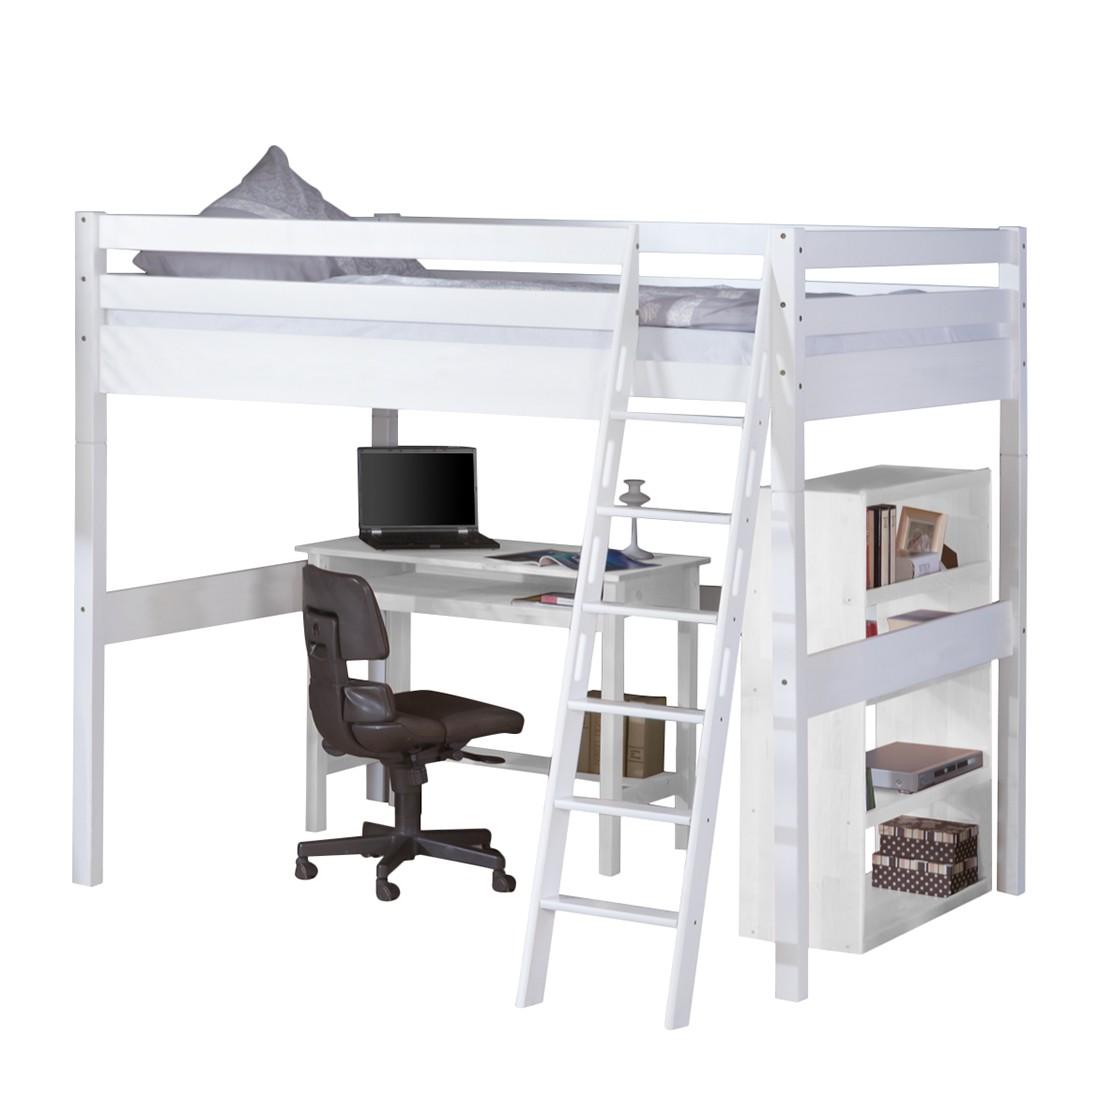 hochbett campus buche wei kinder bett etagenbett jugendbett stockbett ebay. Black Bedroom Furniture Sets. Home Design Ideas